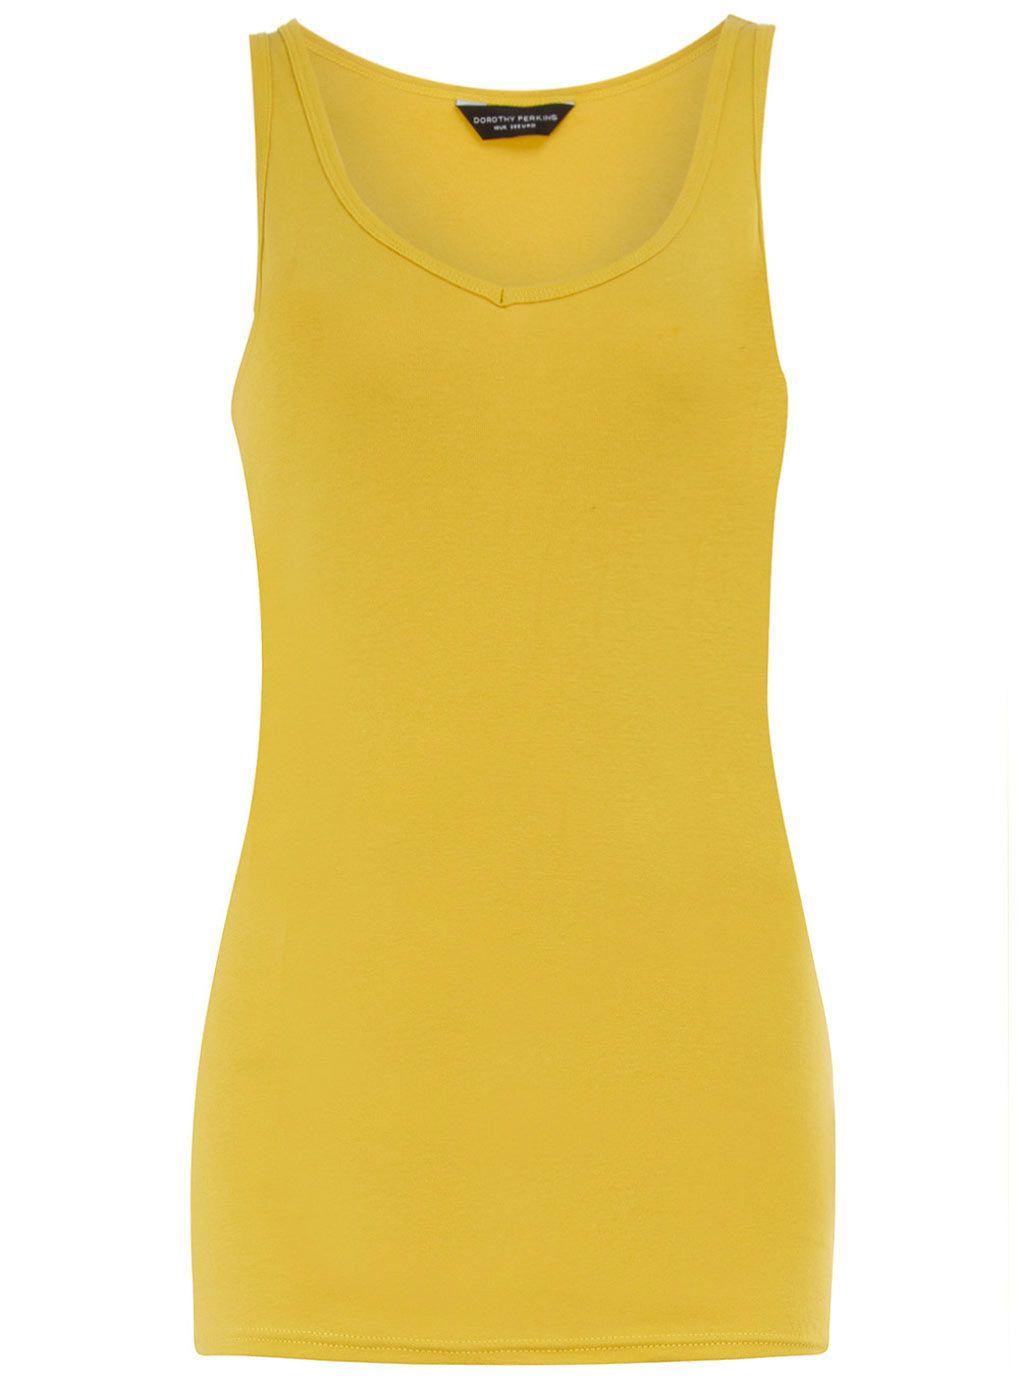 #yellow Chartreuse v neck vest